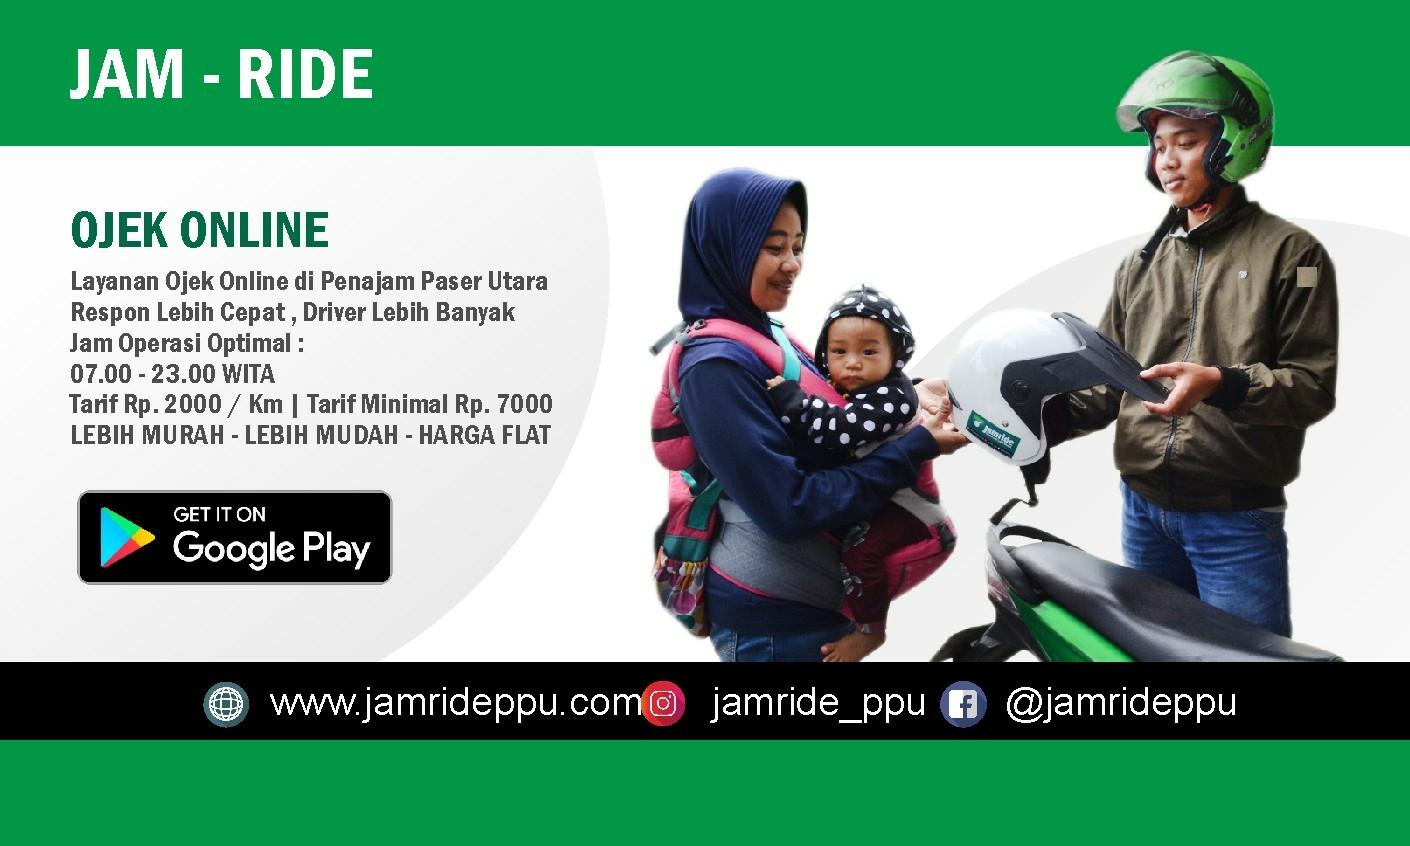 JAMRIDE 1